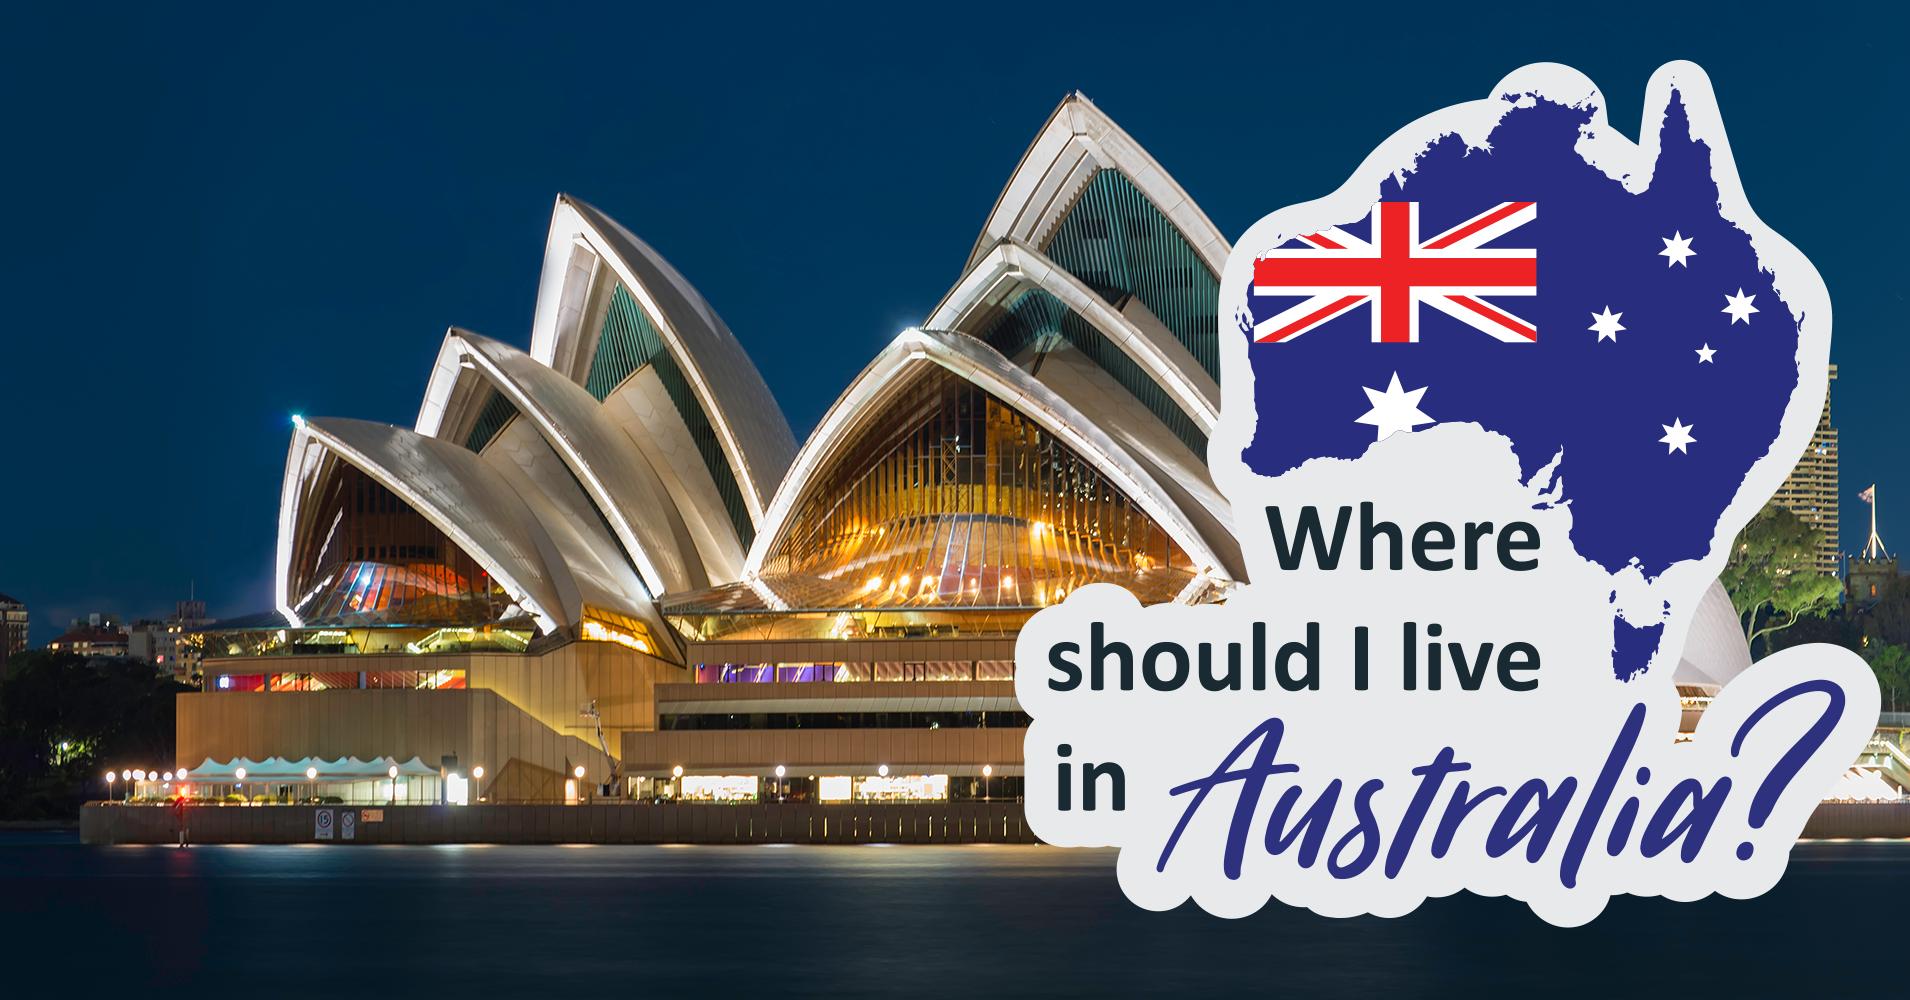 Should i do online dating in Australia